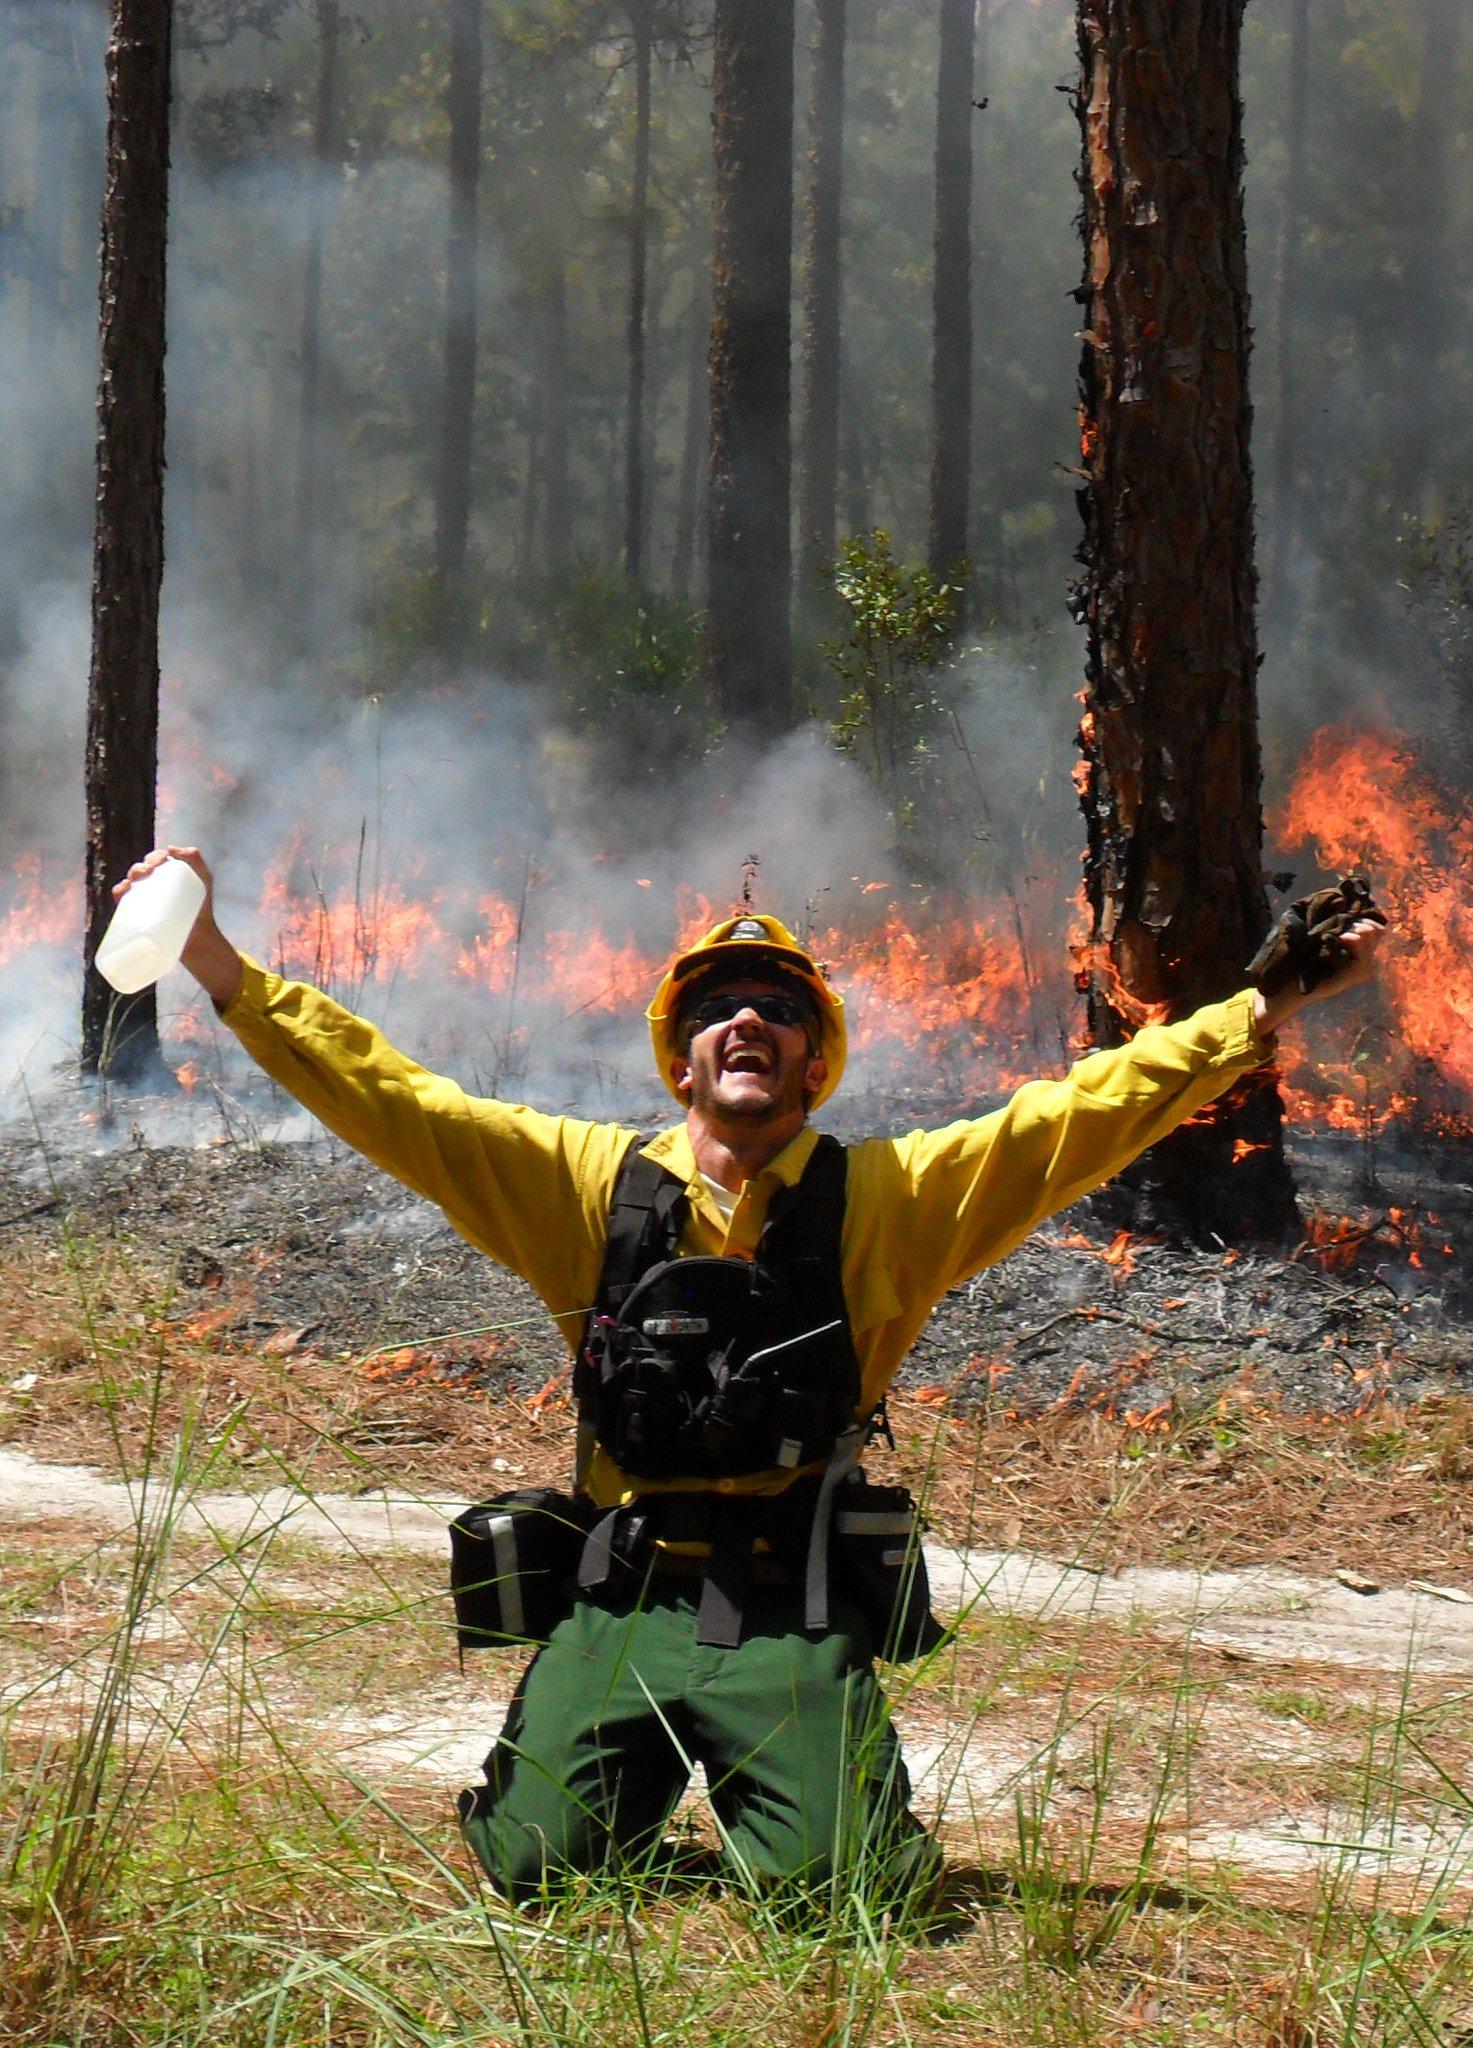 Florida Park Service - Controlled Burn